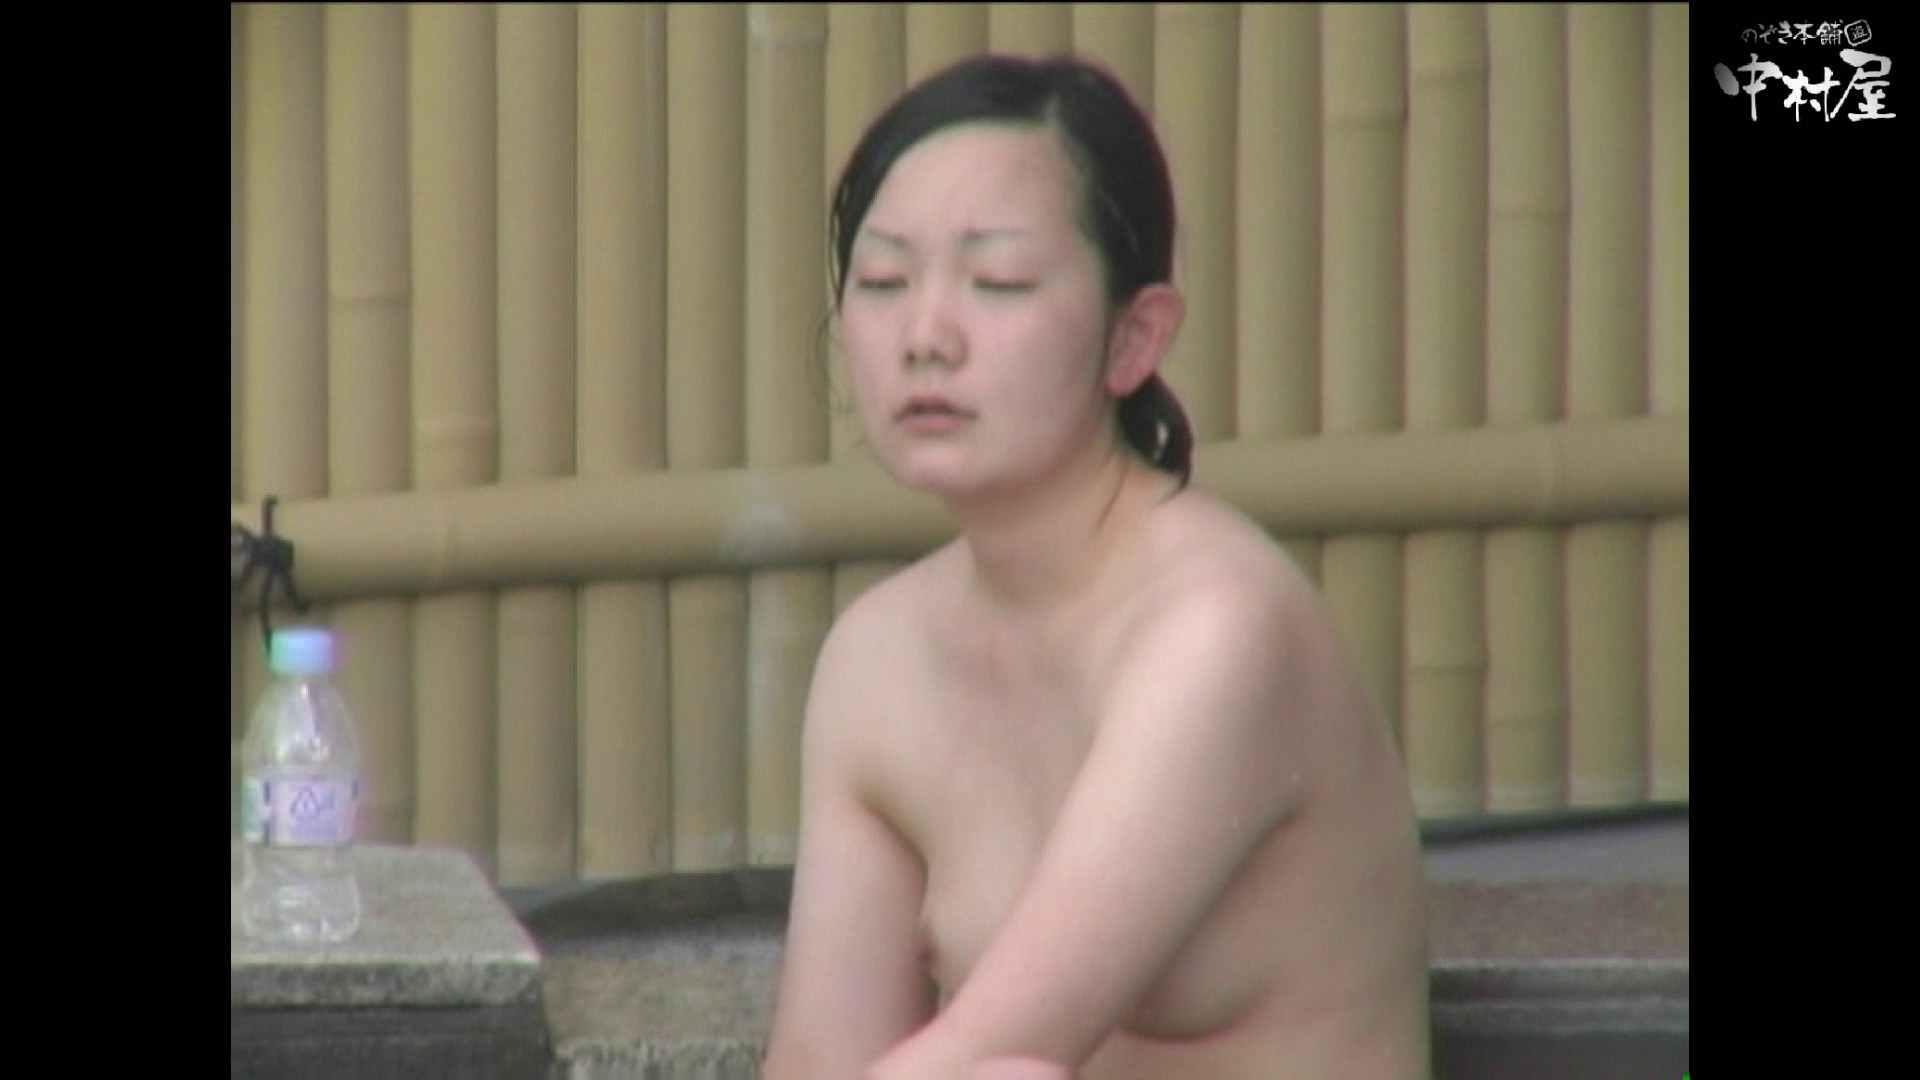 Aquaな露天風呂Vol.892 盗撮 われめAV動画紹介 80画像 68